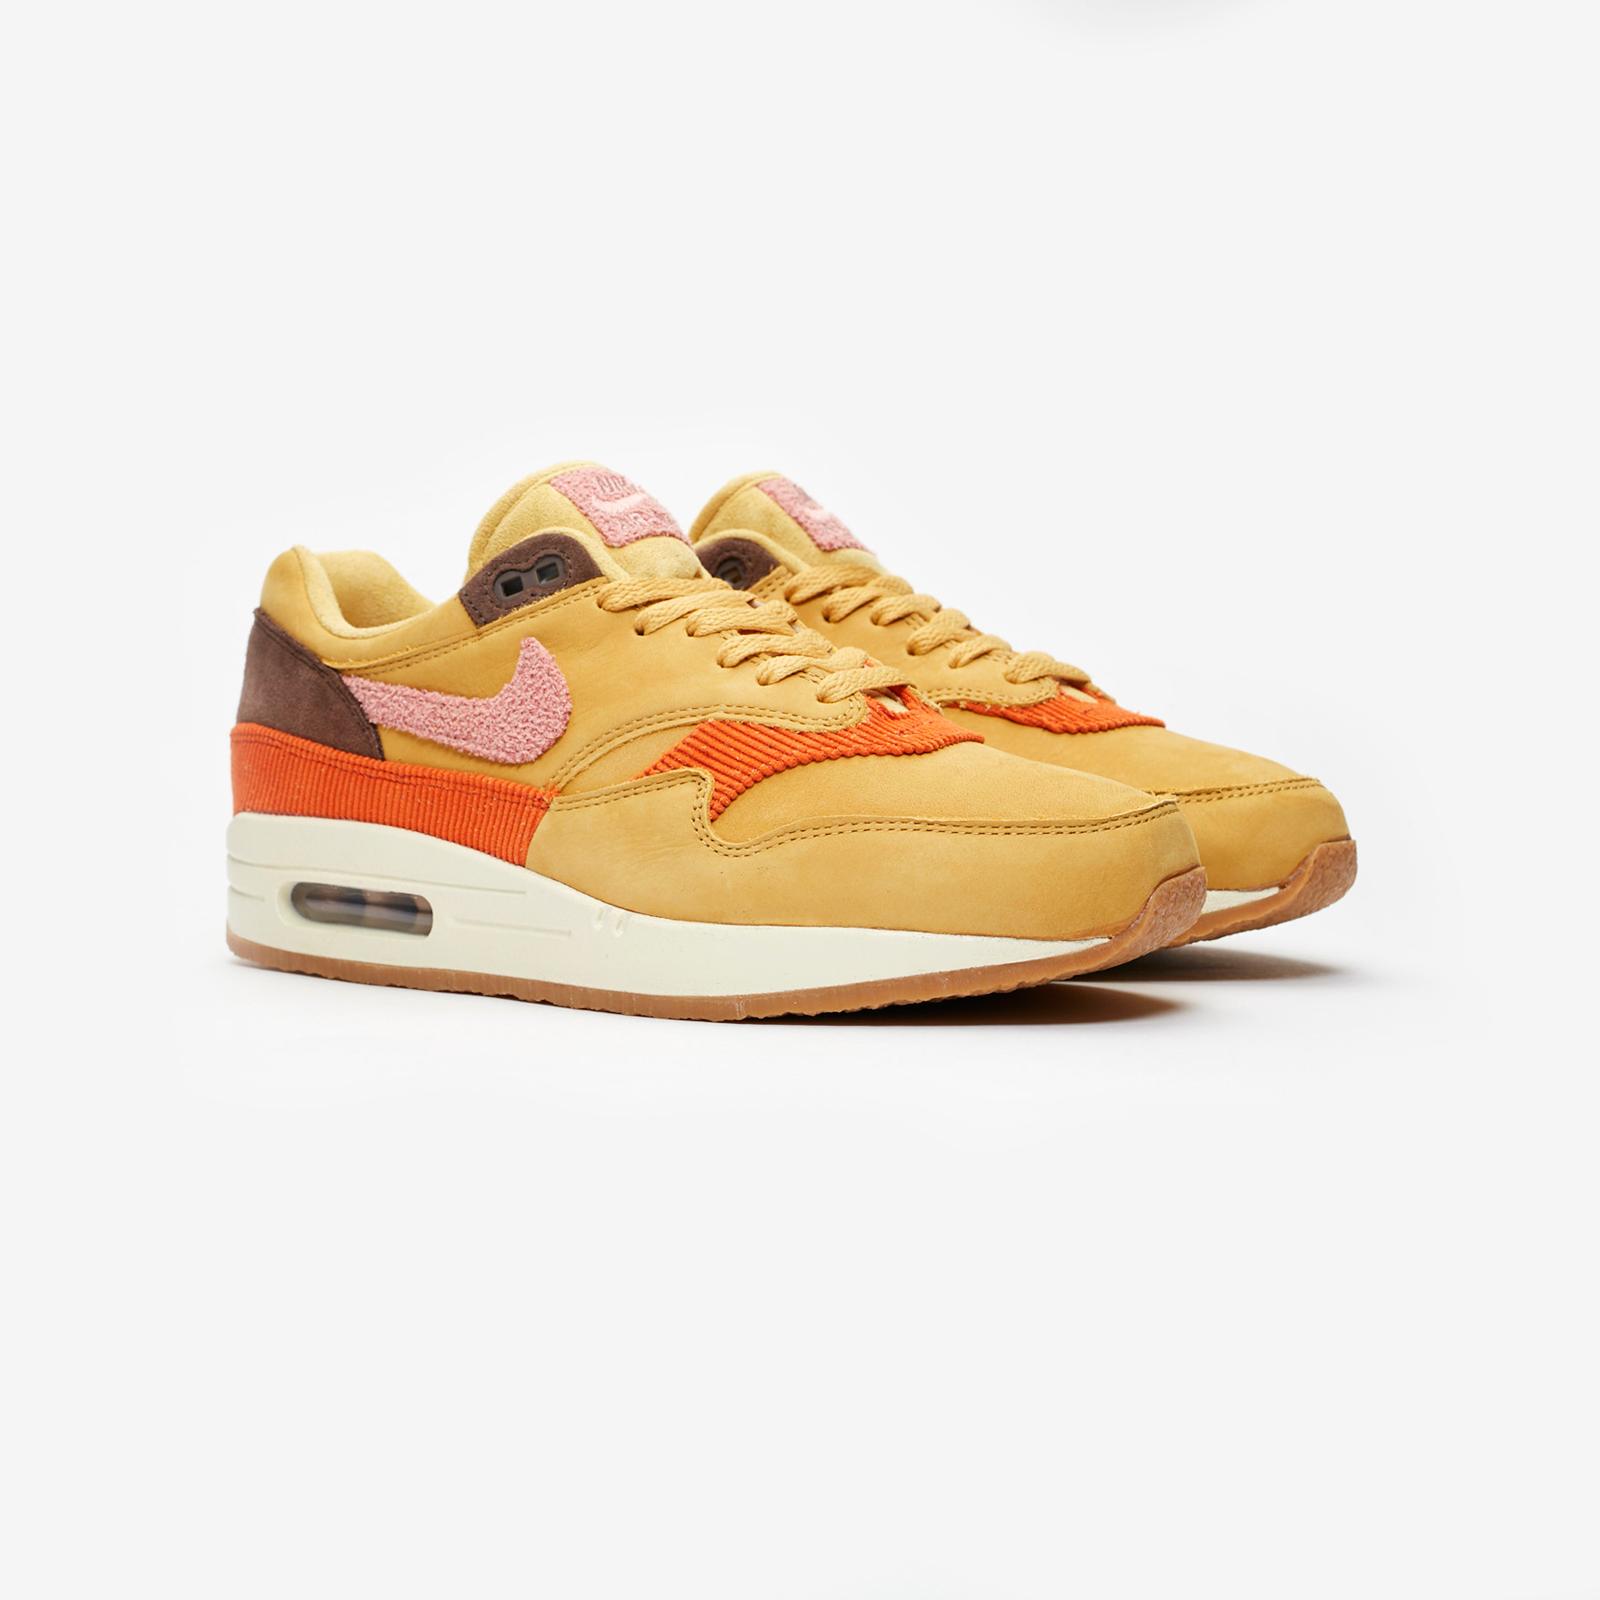 fb6b376c52 Nike Air Max 1 - Cd7861-700 - Sneakersnstuff | sneakers & streetwear ...